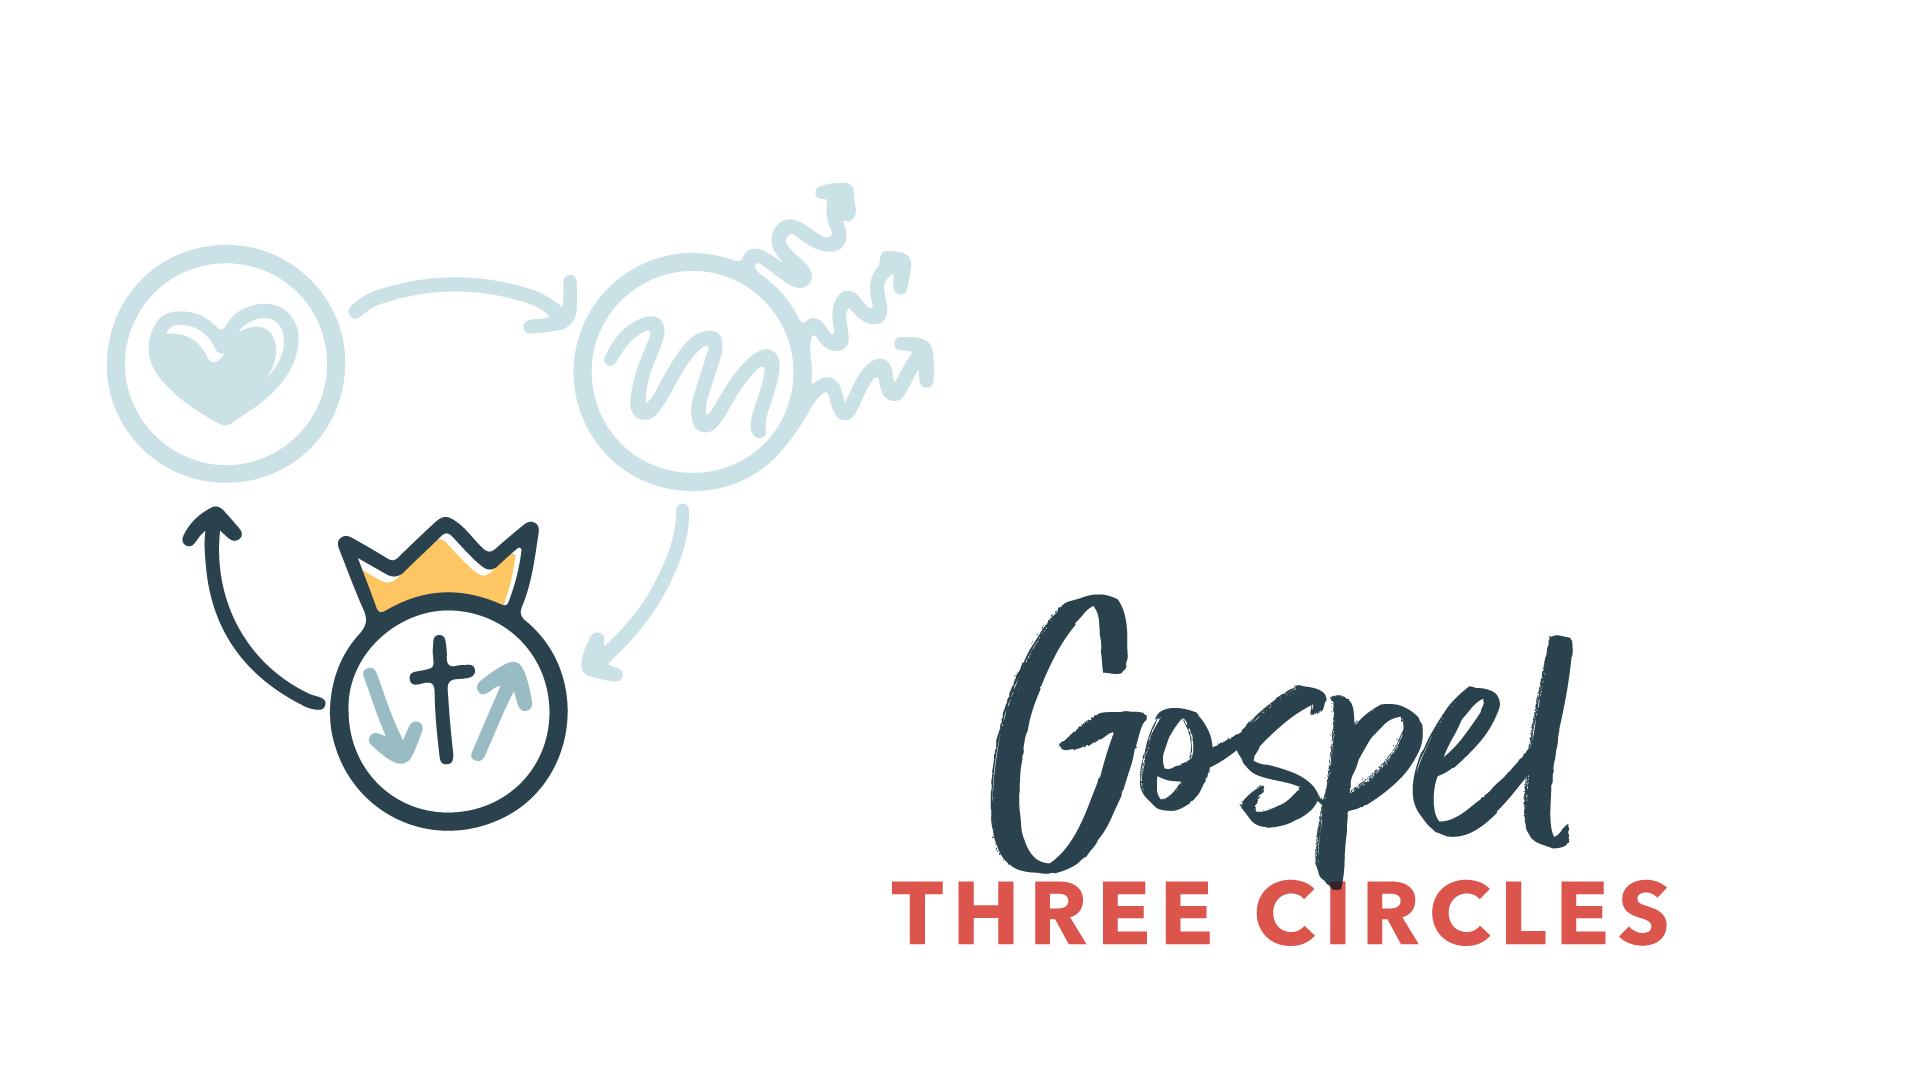 3 Circles Part 3